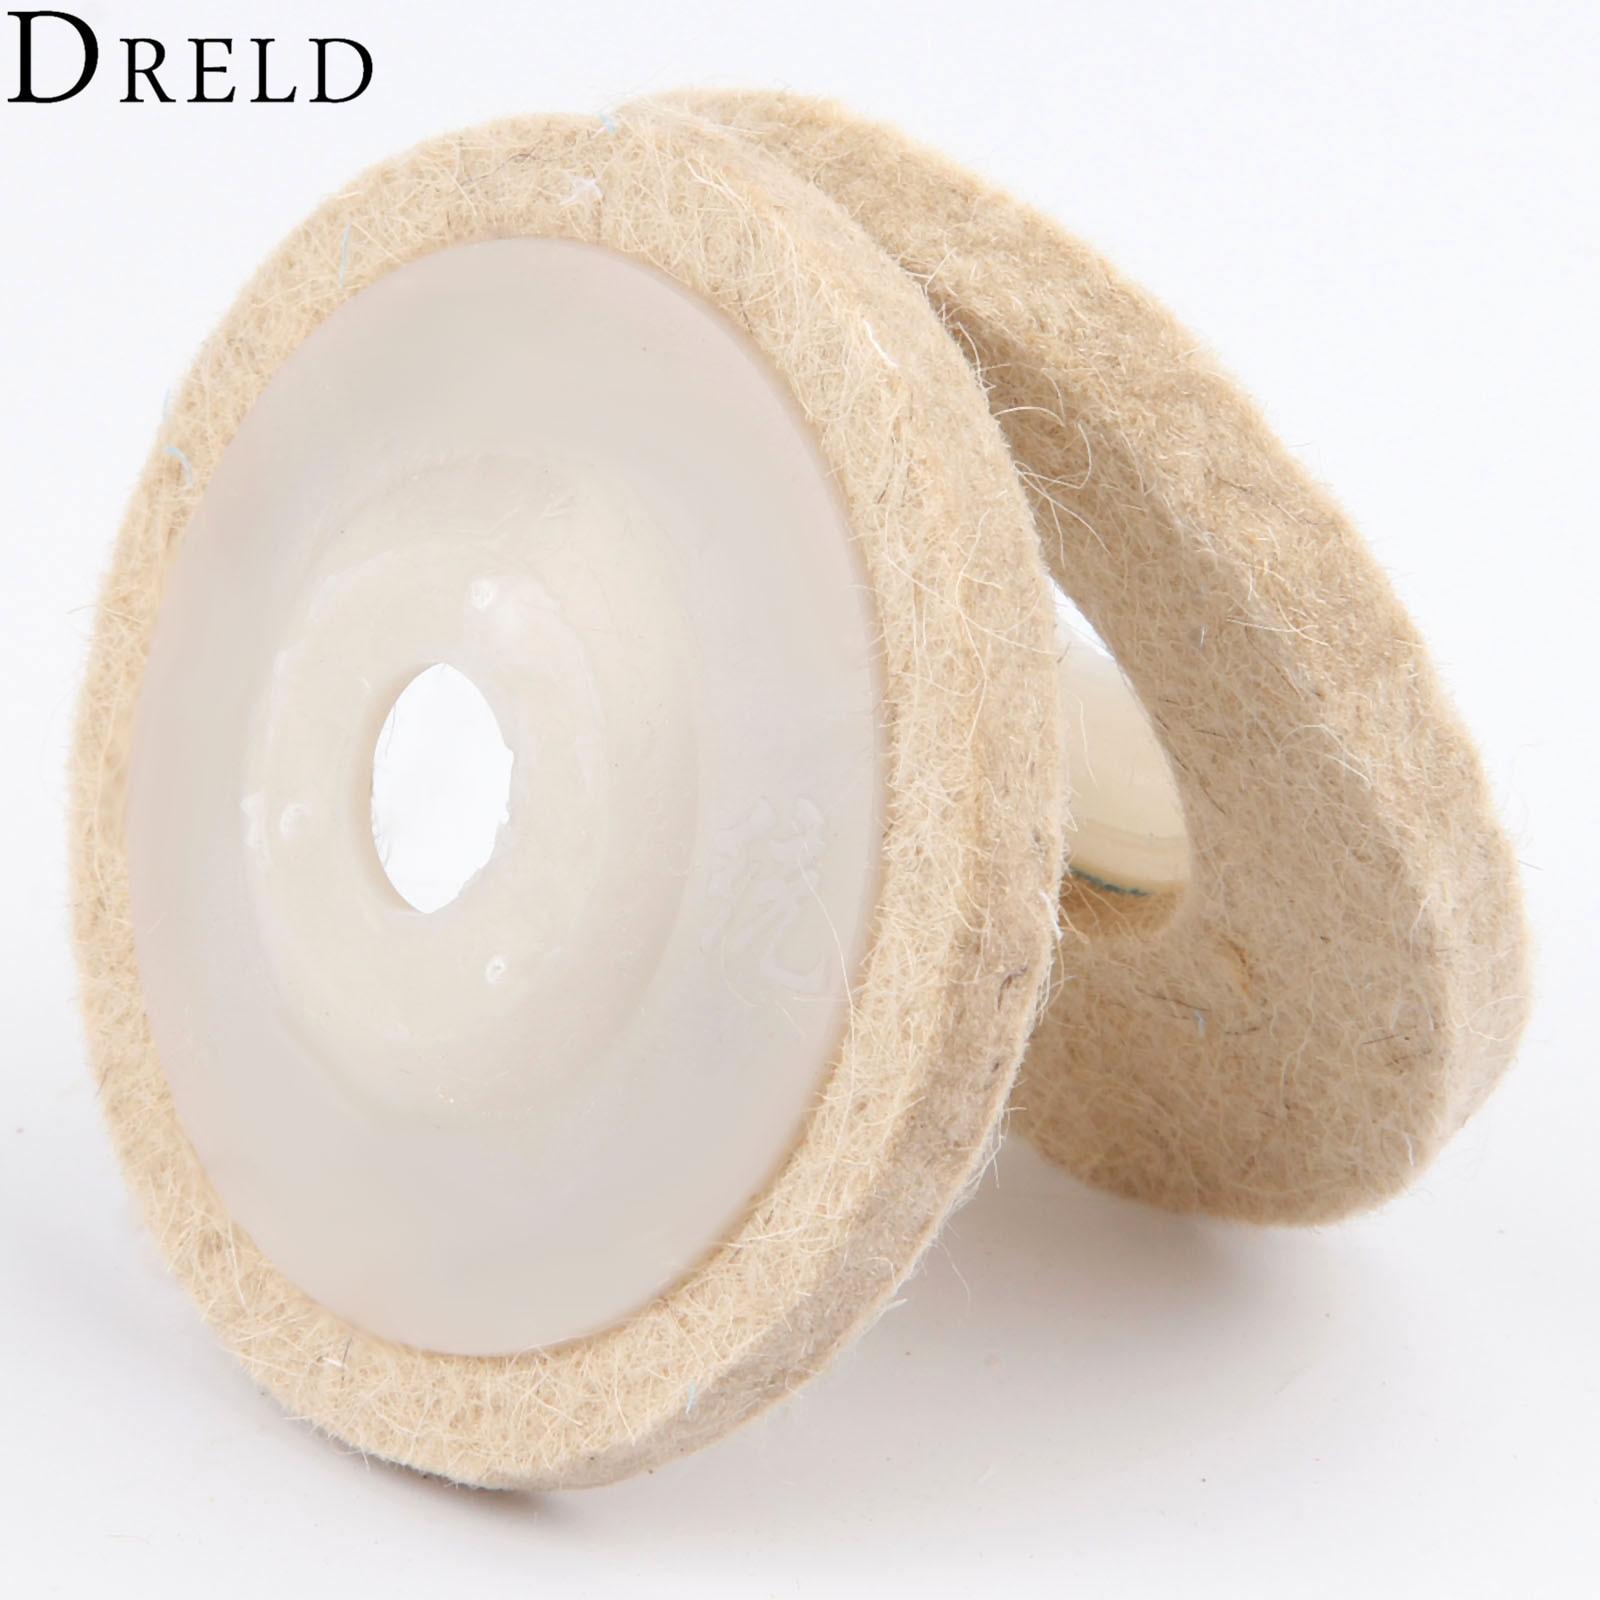 DRELD 80mm/3inch Dremel Accessories Polishing Pad Wool Felt Buffing Wheel Grinding Pad Polisher Disc For Metal Marble Ceramics